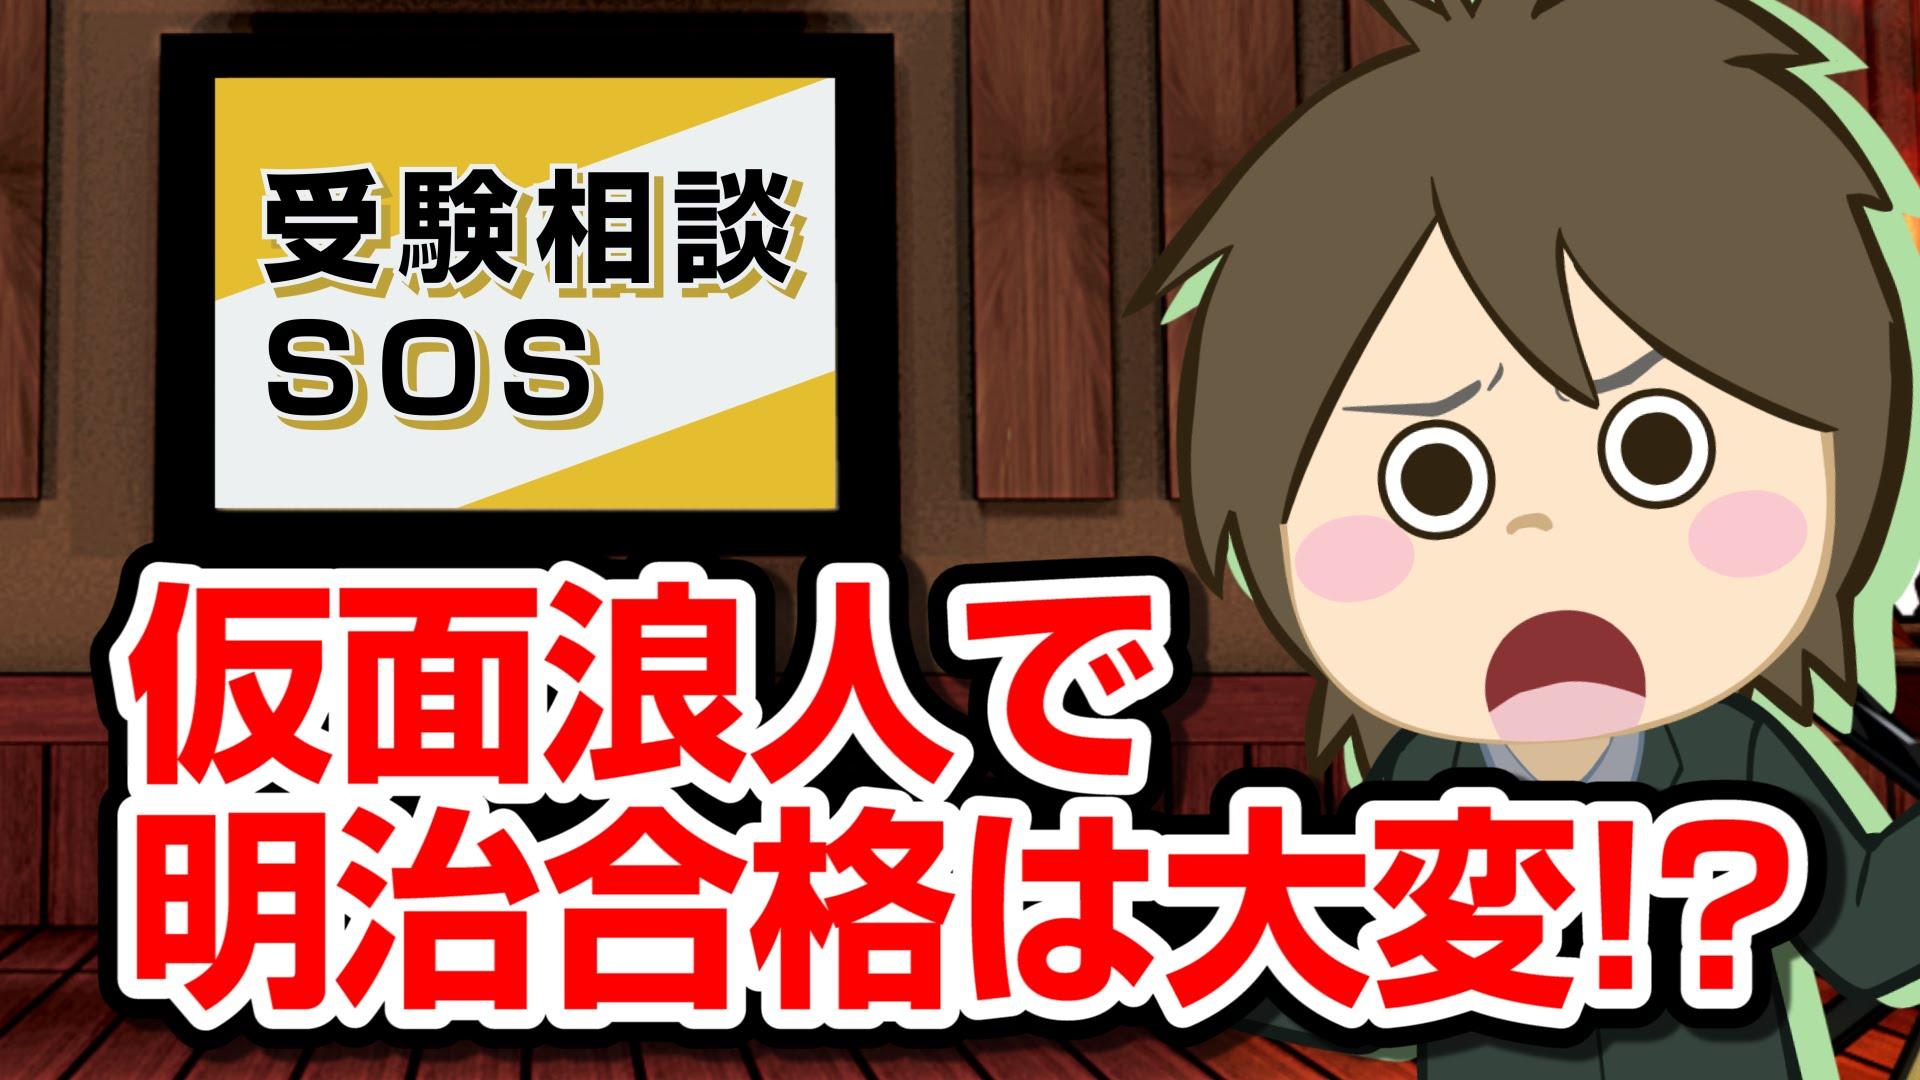 【vol.109】仮面浪人で明治合格するためには?|受験相談SOS